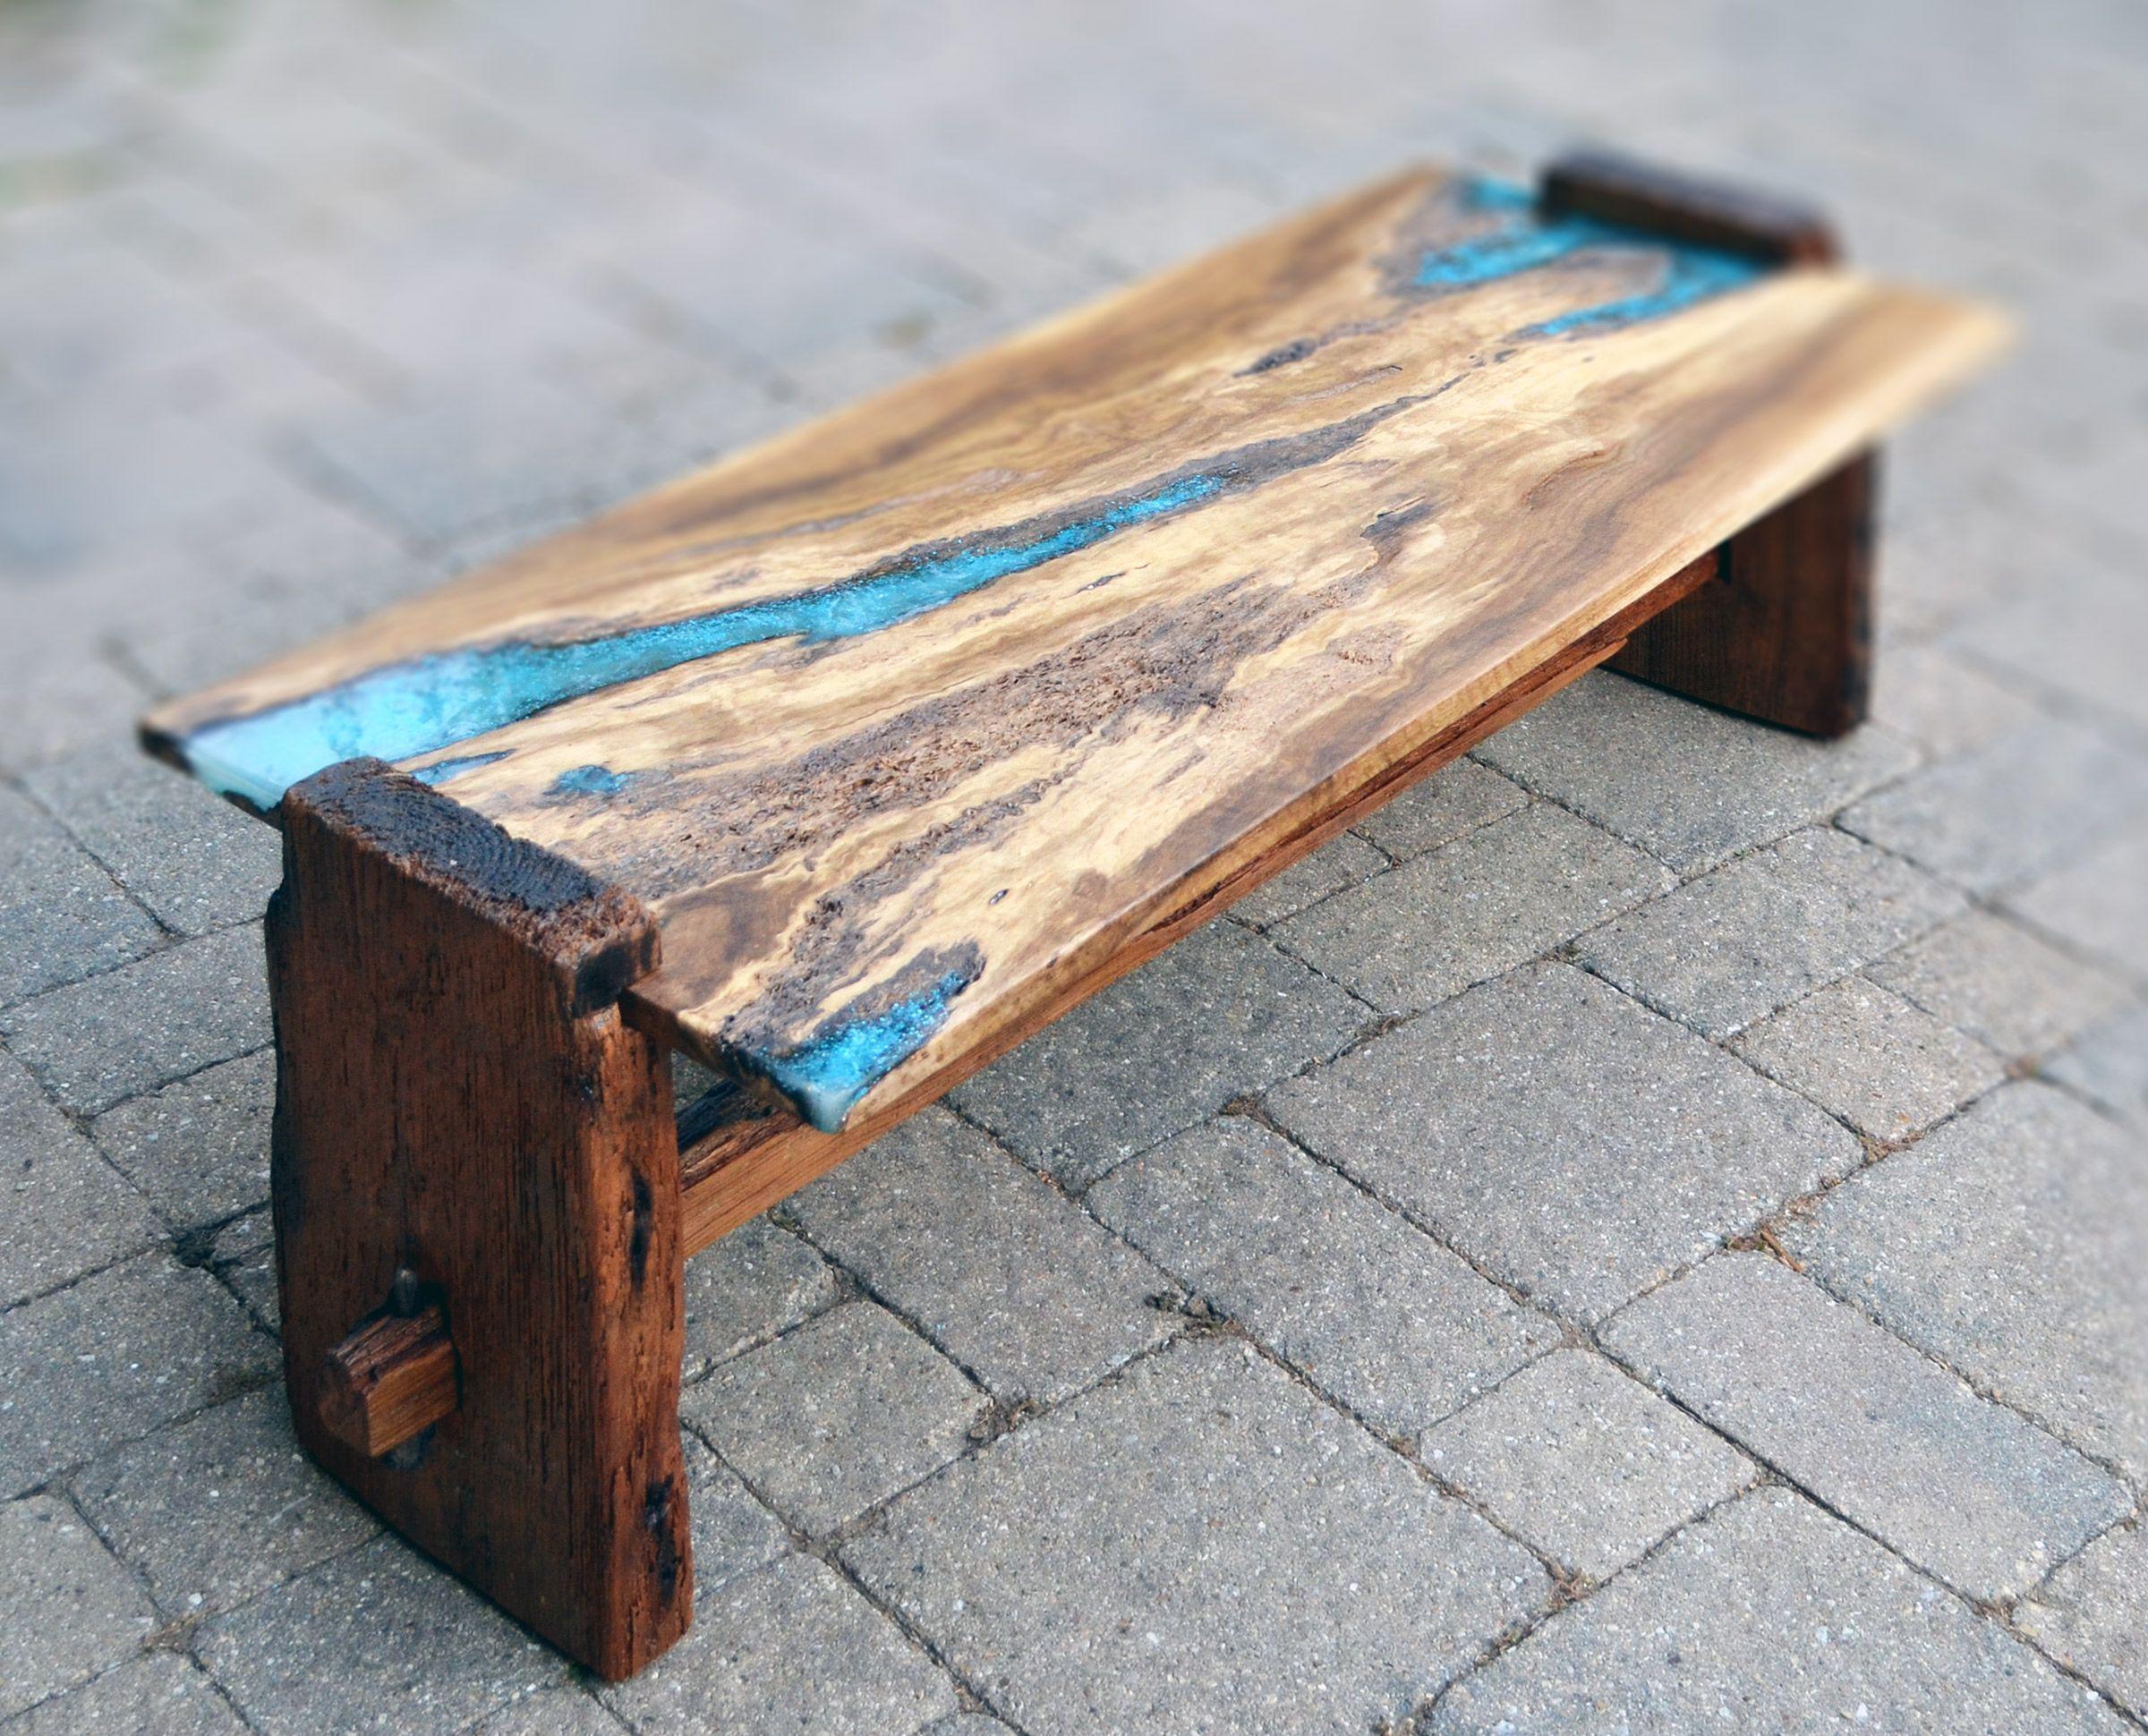 Live Edge Rustic Oak Coffee Table With Epoxy Resin Inlay Rustic Oak Coffee Table Coffee Table Coffee Table Farmhouse [ 1940 x 2400 Pixel ]